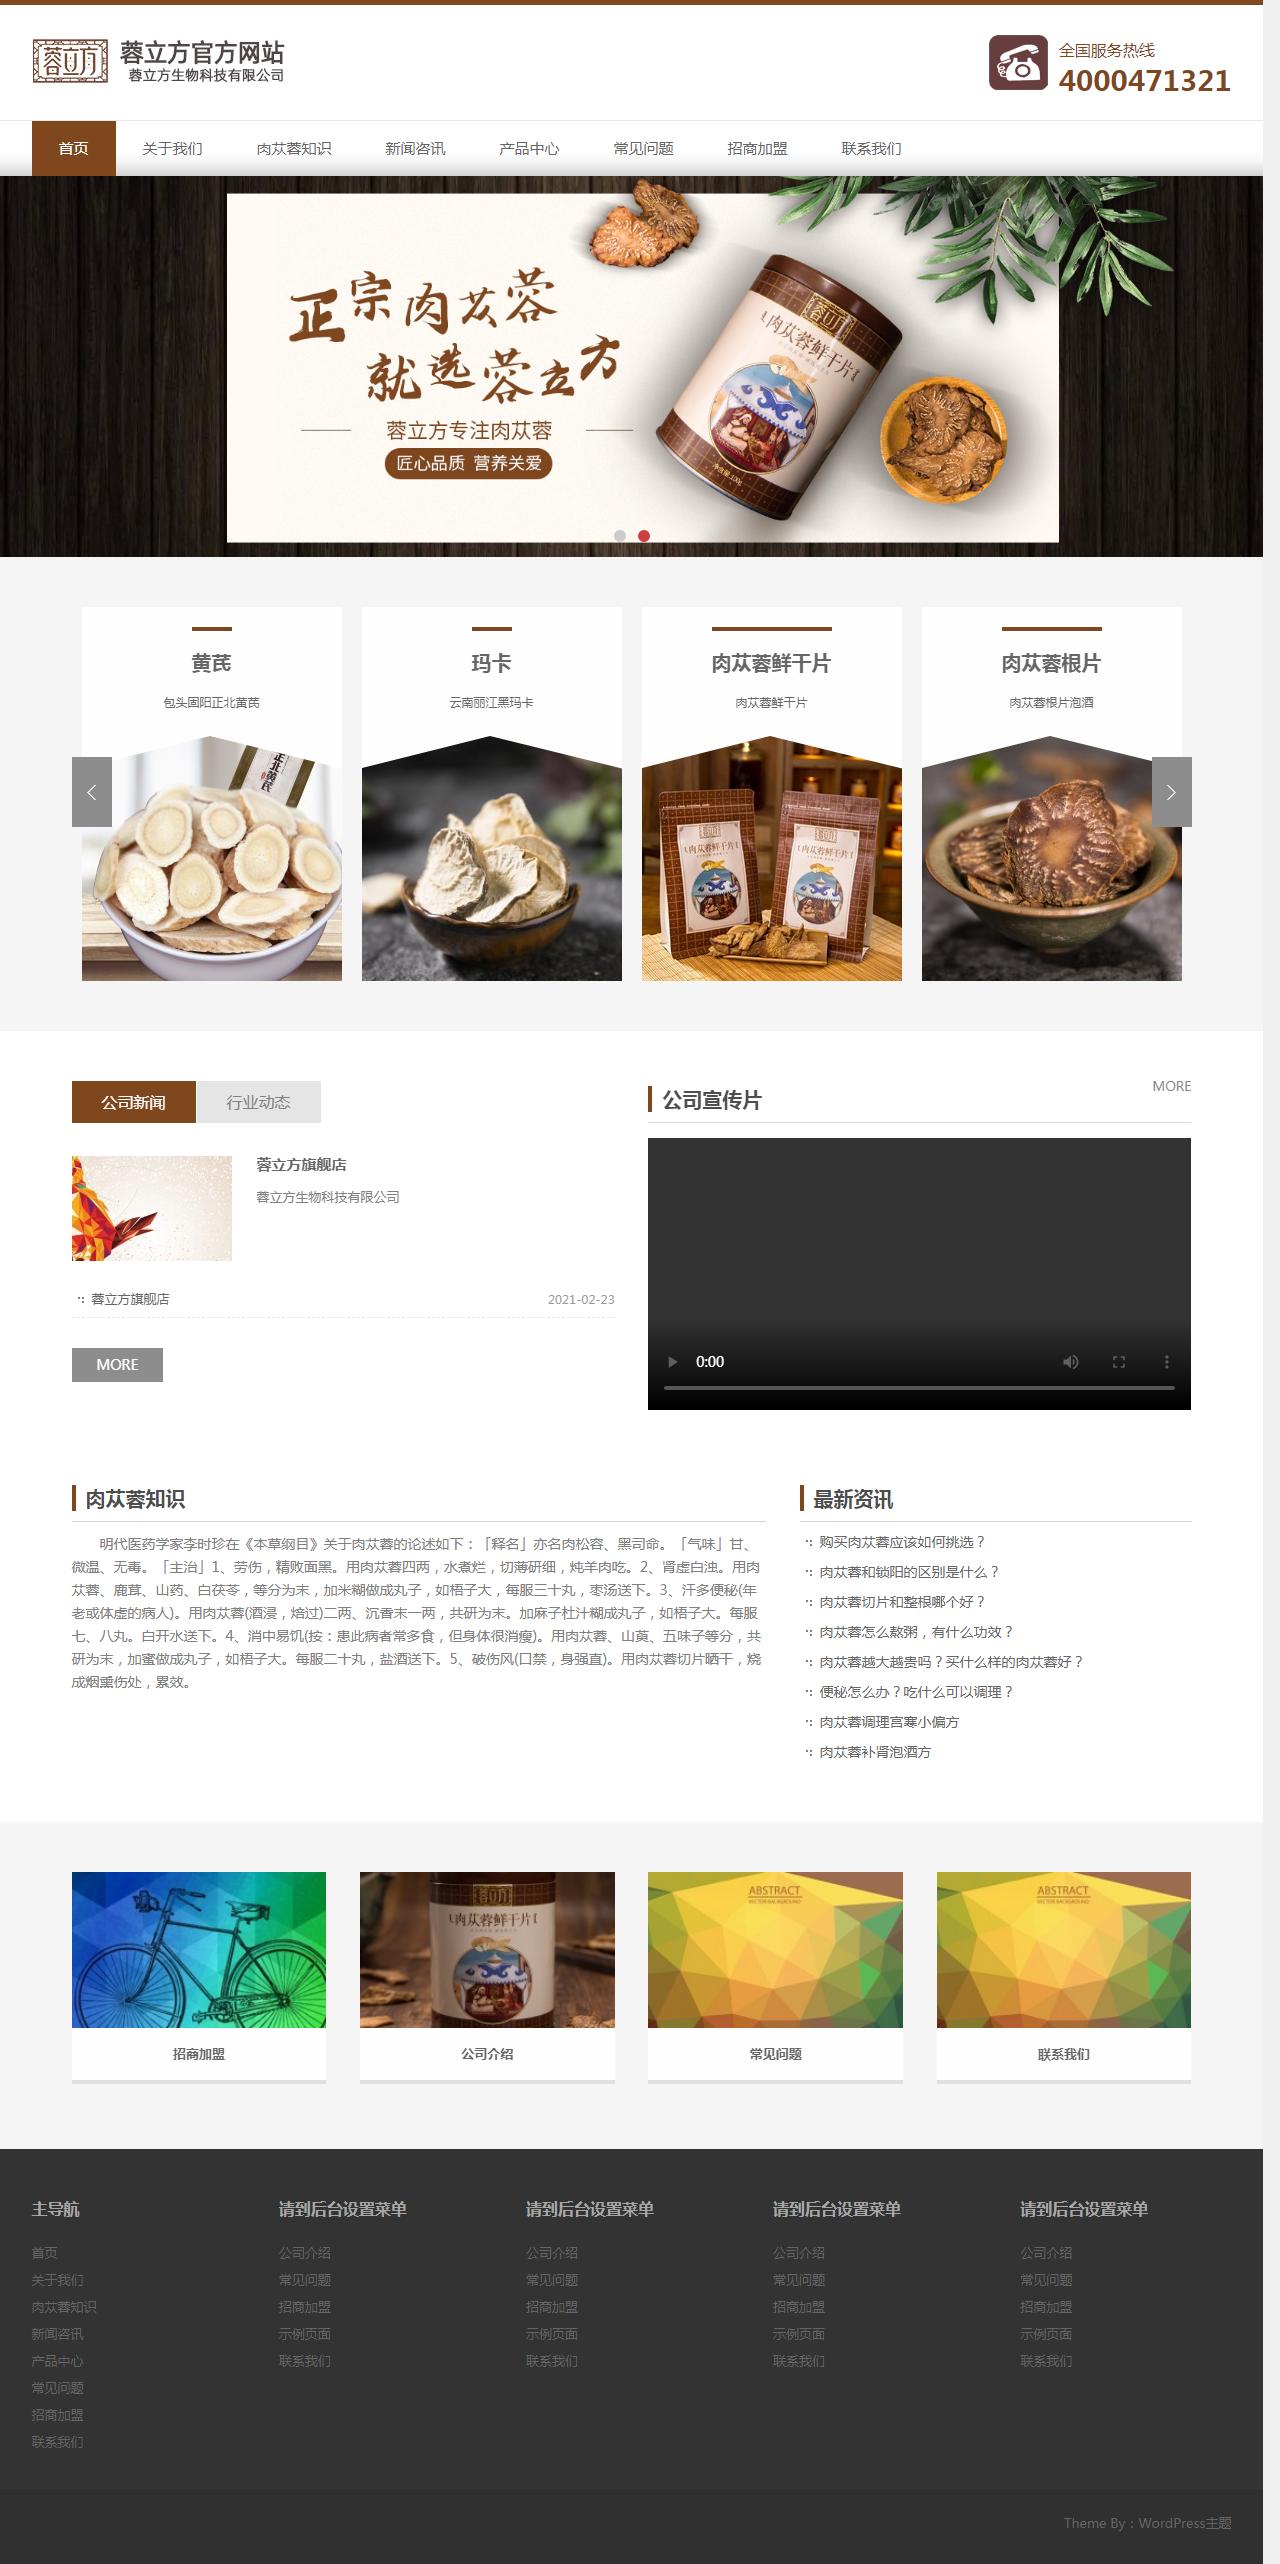 X1-企业通用v1.1.6—响应式wordpress企业主题,wordpress模板,公司网站模板,企业模板